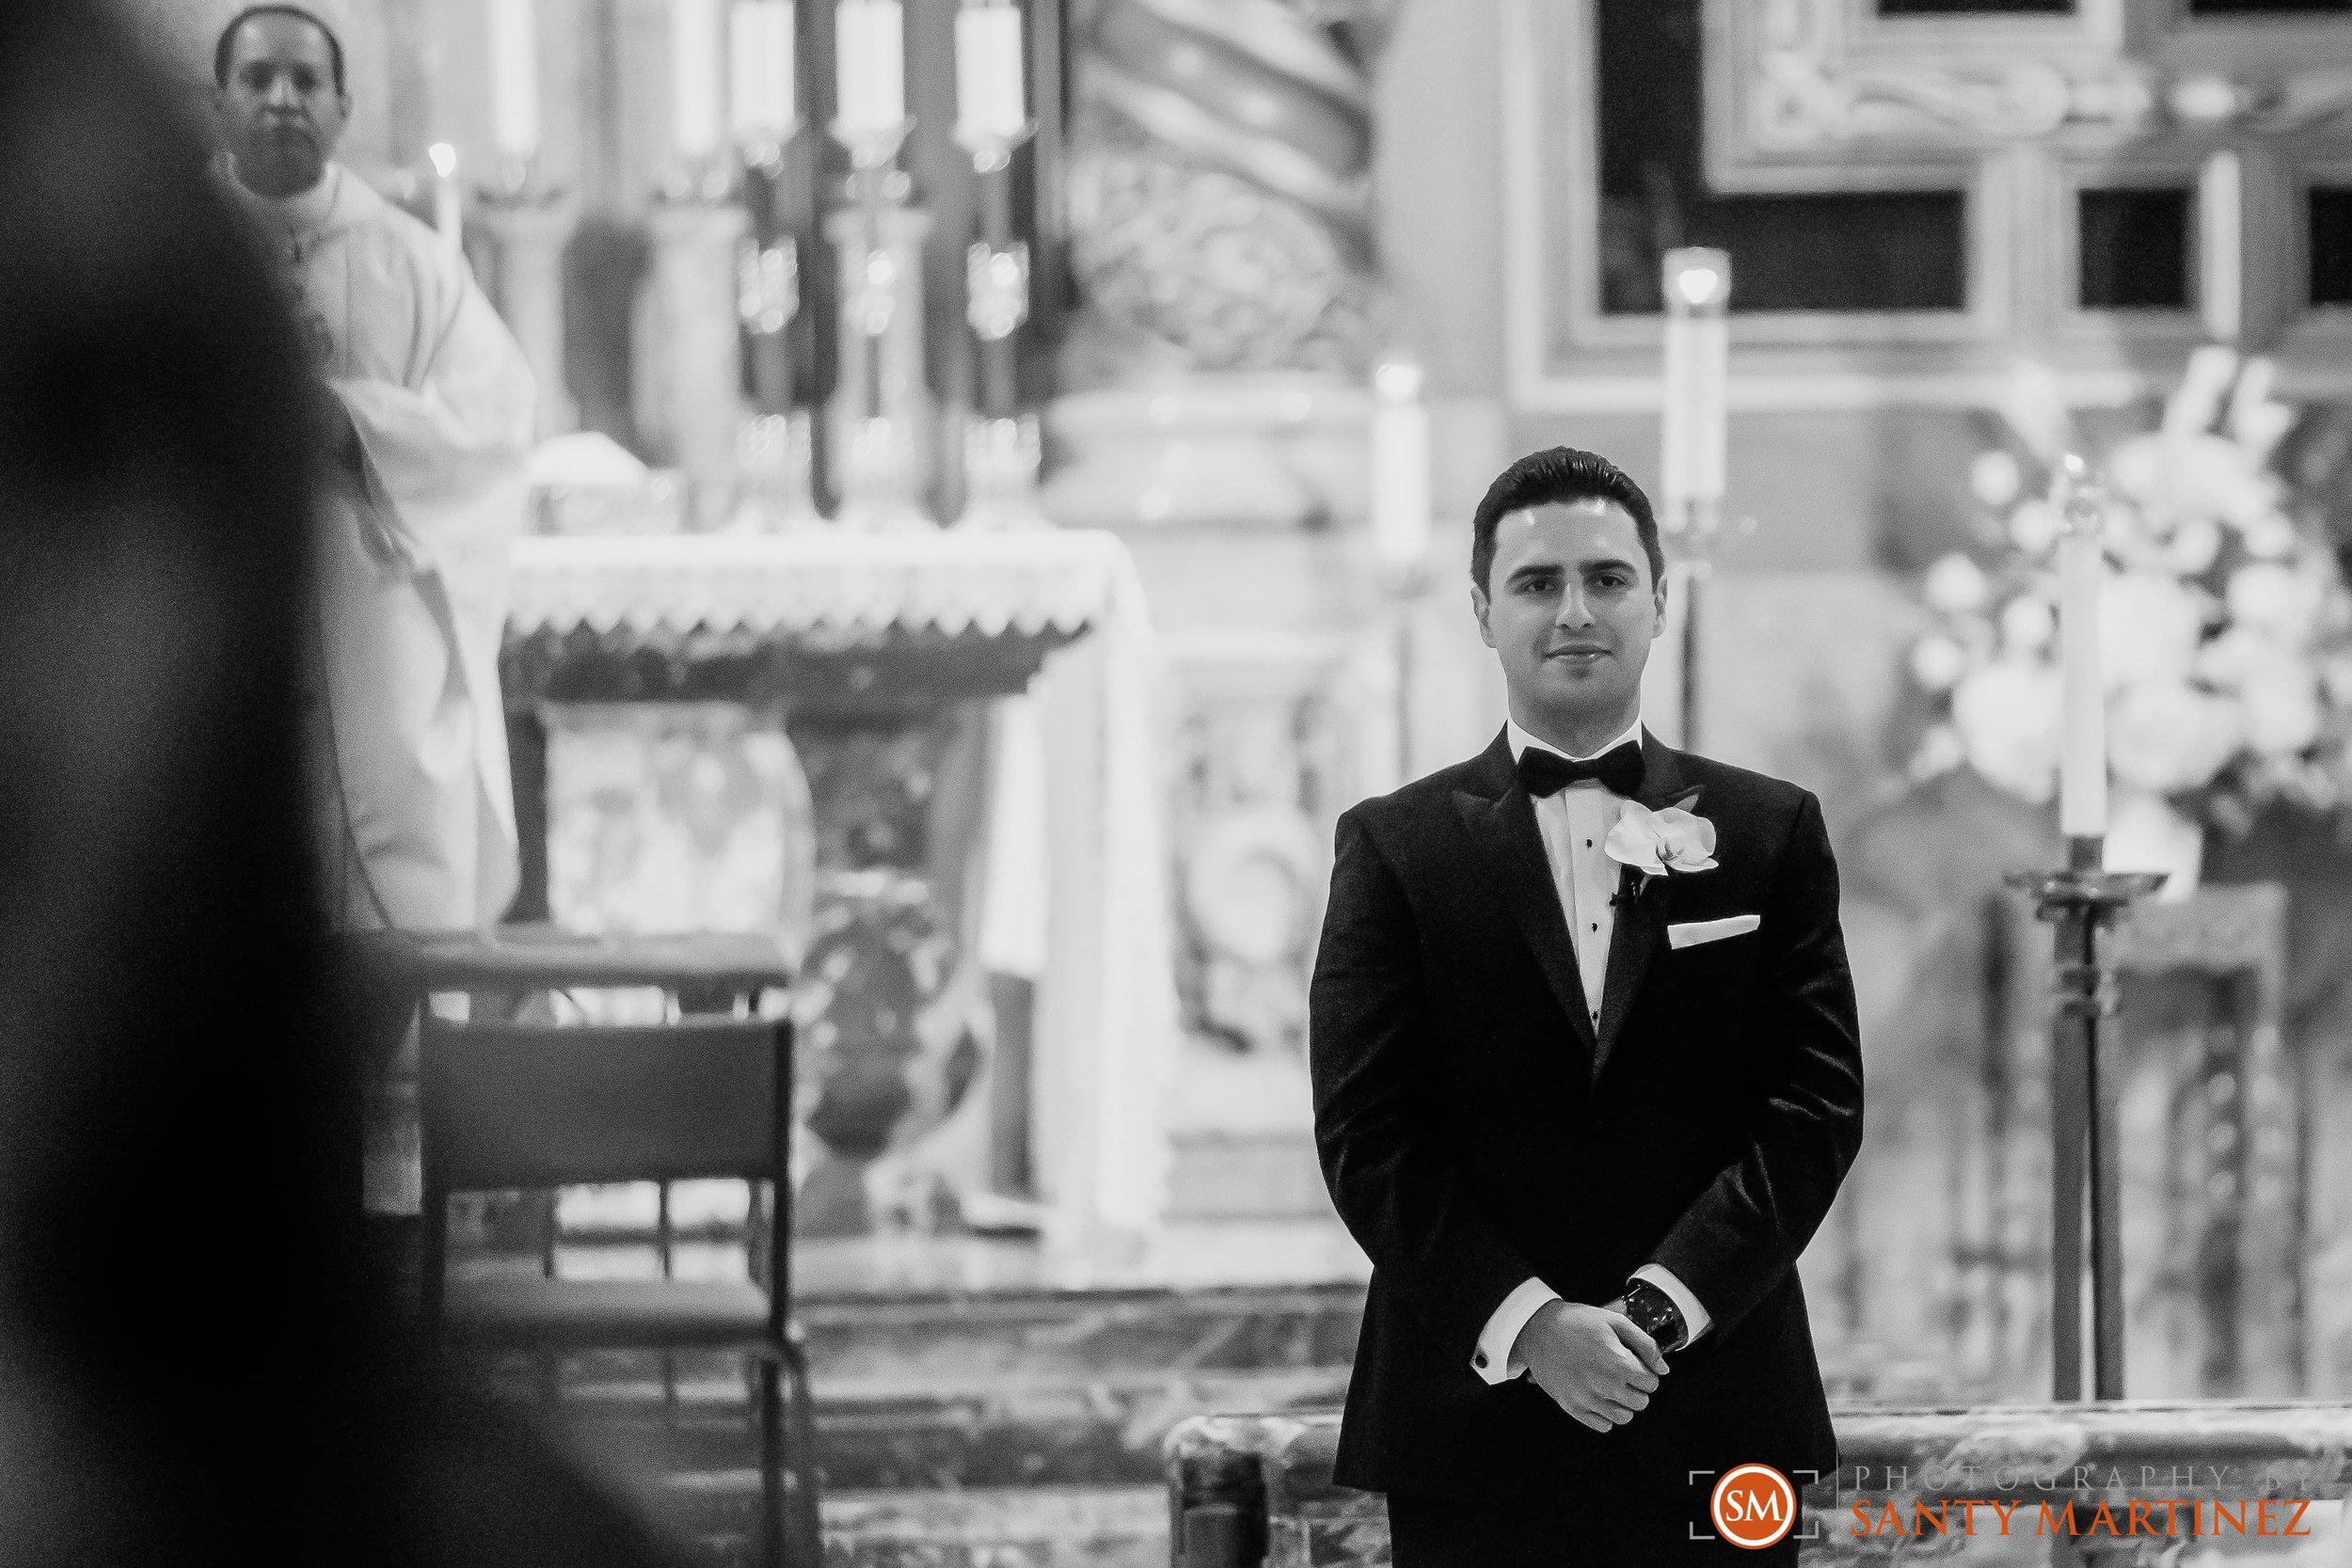 Wedding Trump National Doral Miami - Photography by Santy Martinez-11.jpg